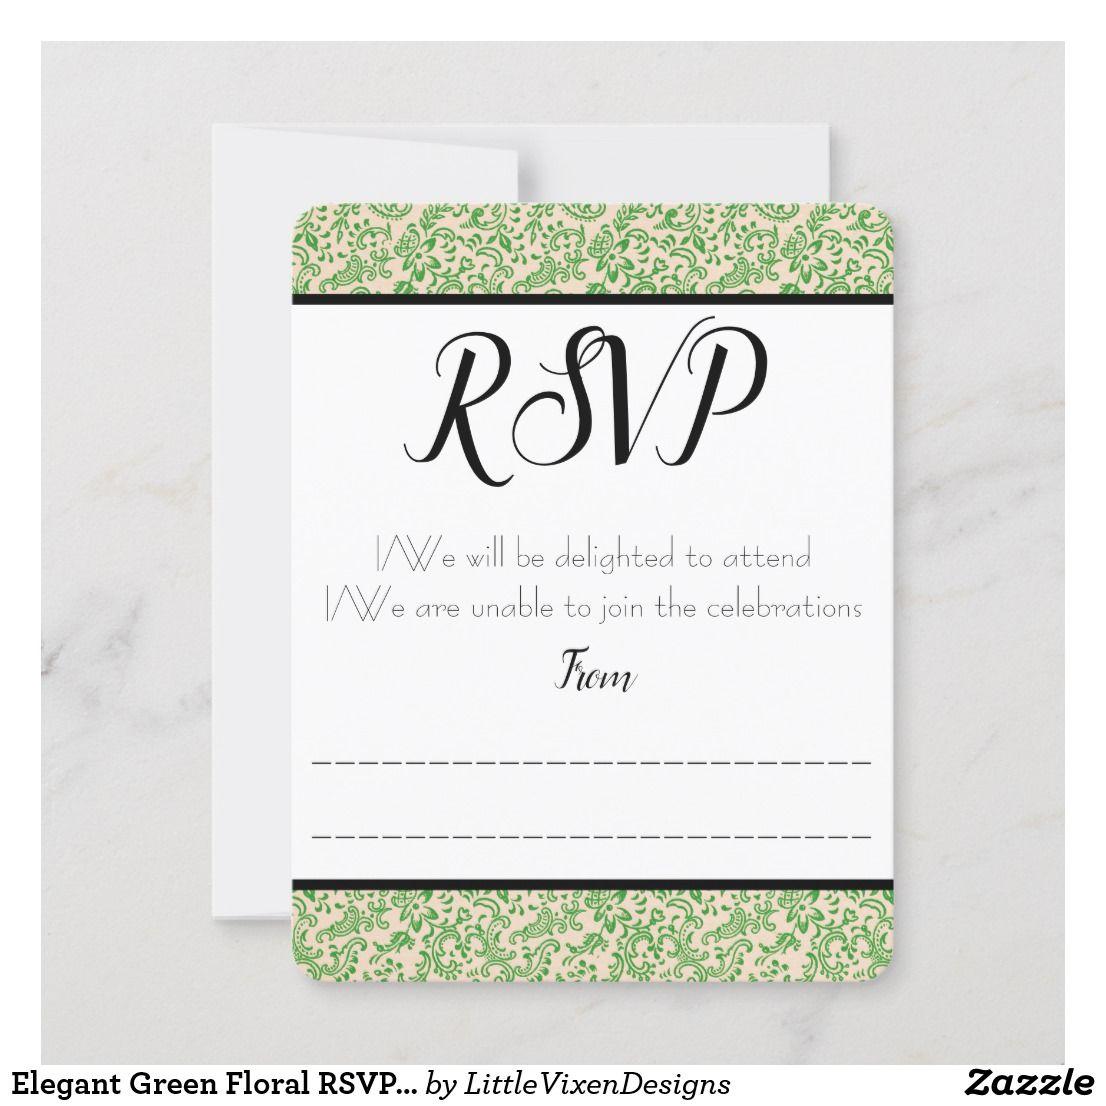 Elegant Green Floral RSVP / Response Card Zazzle.co.uk